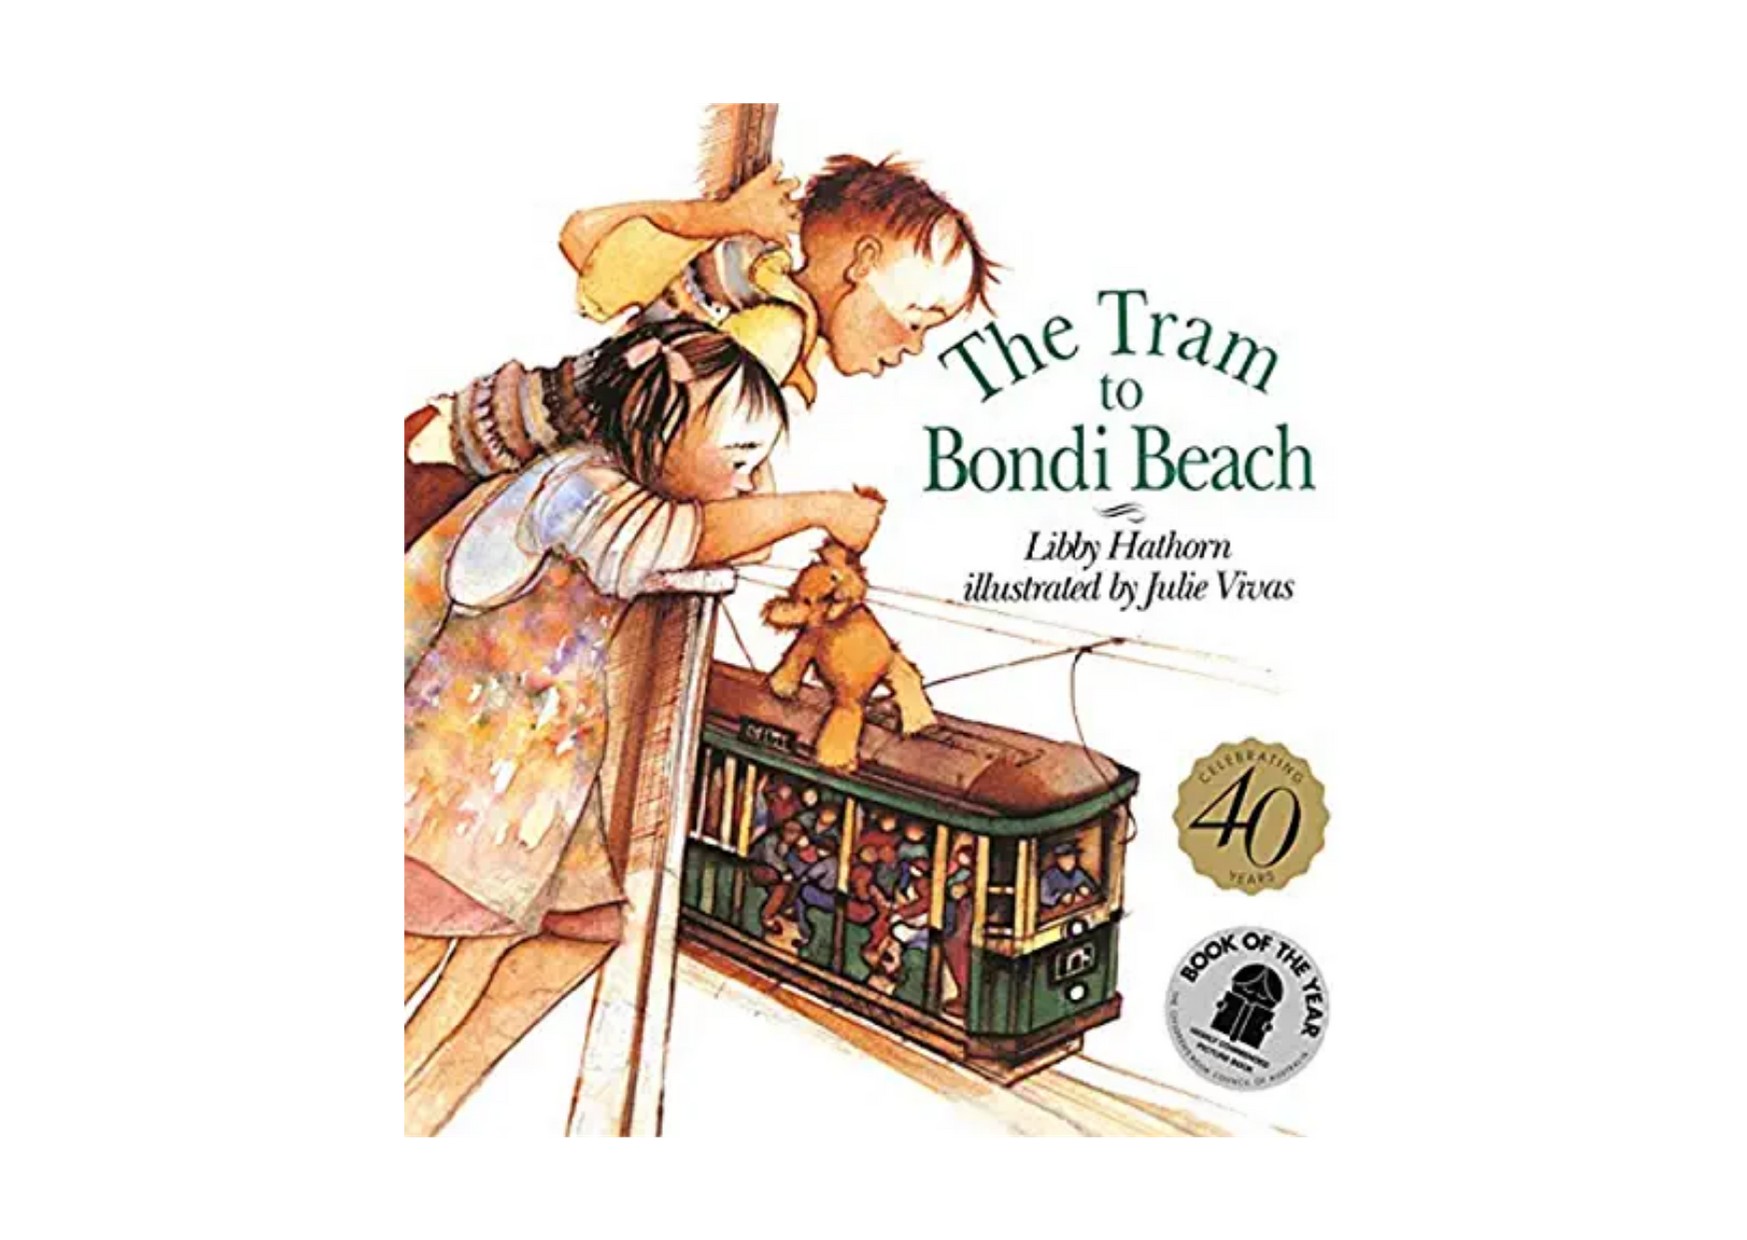 Libby Hathorn - The Tram to Bondi